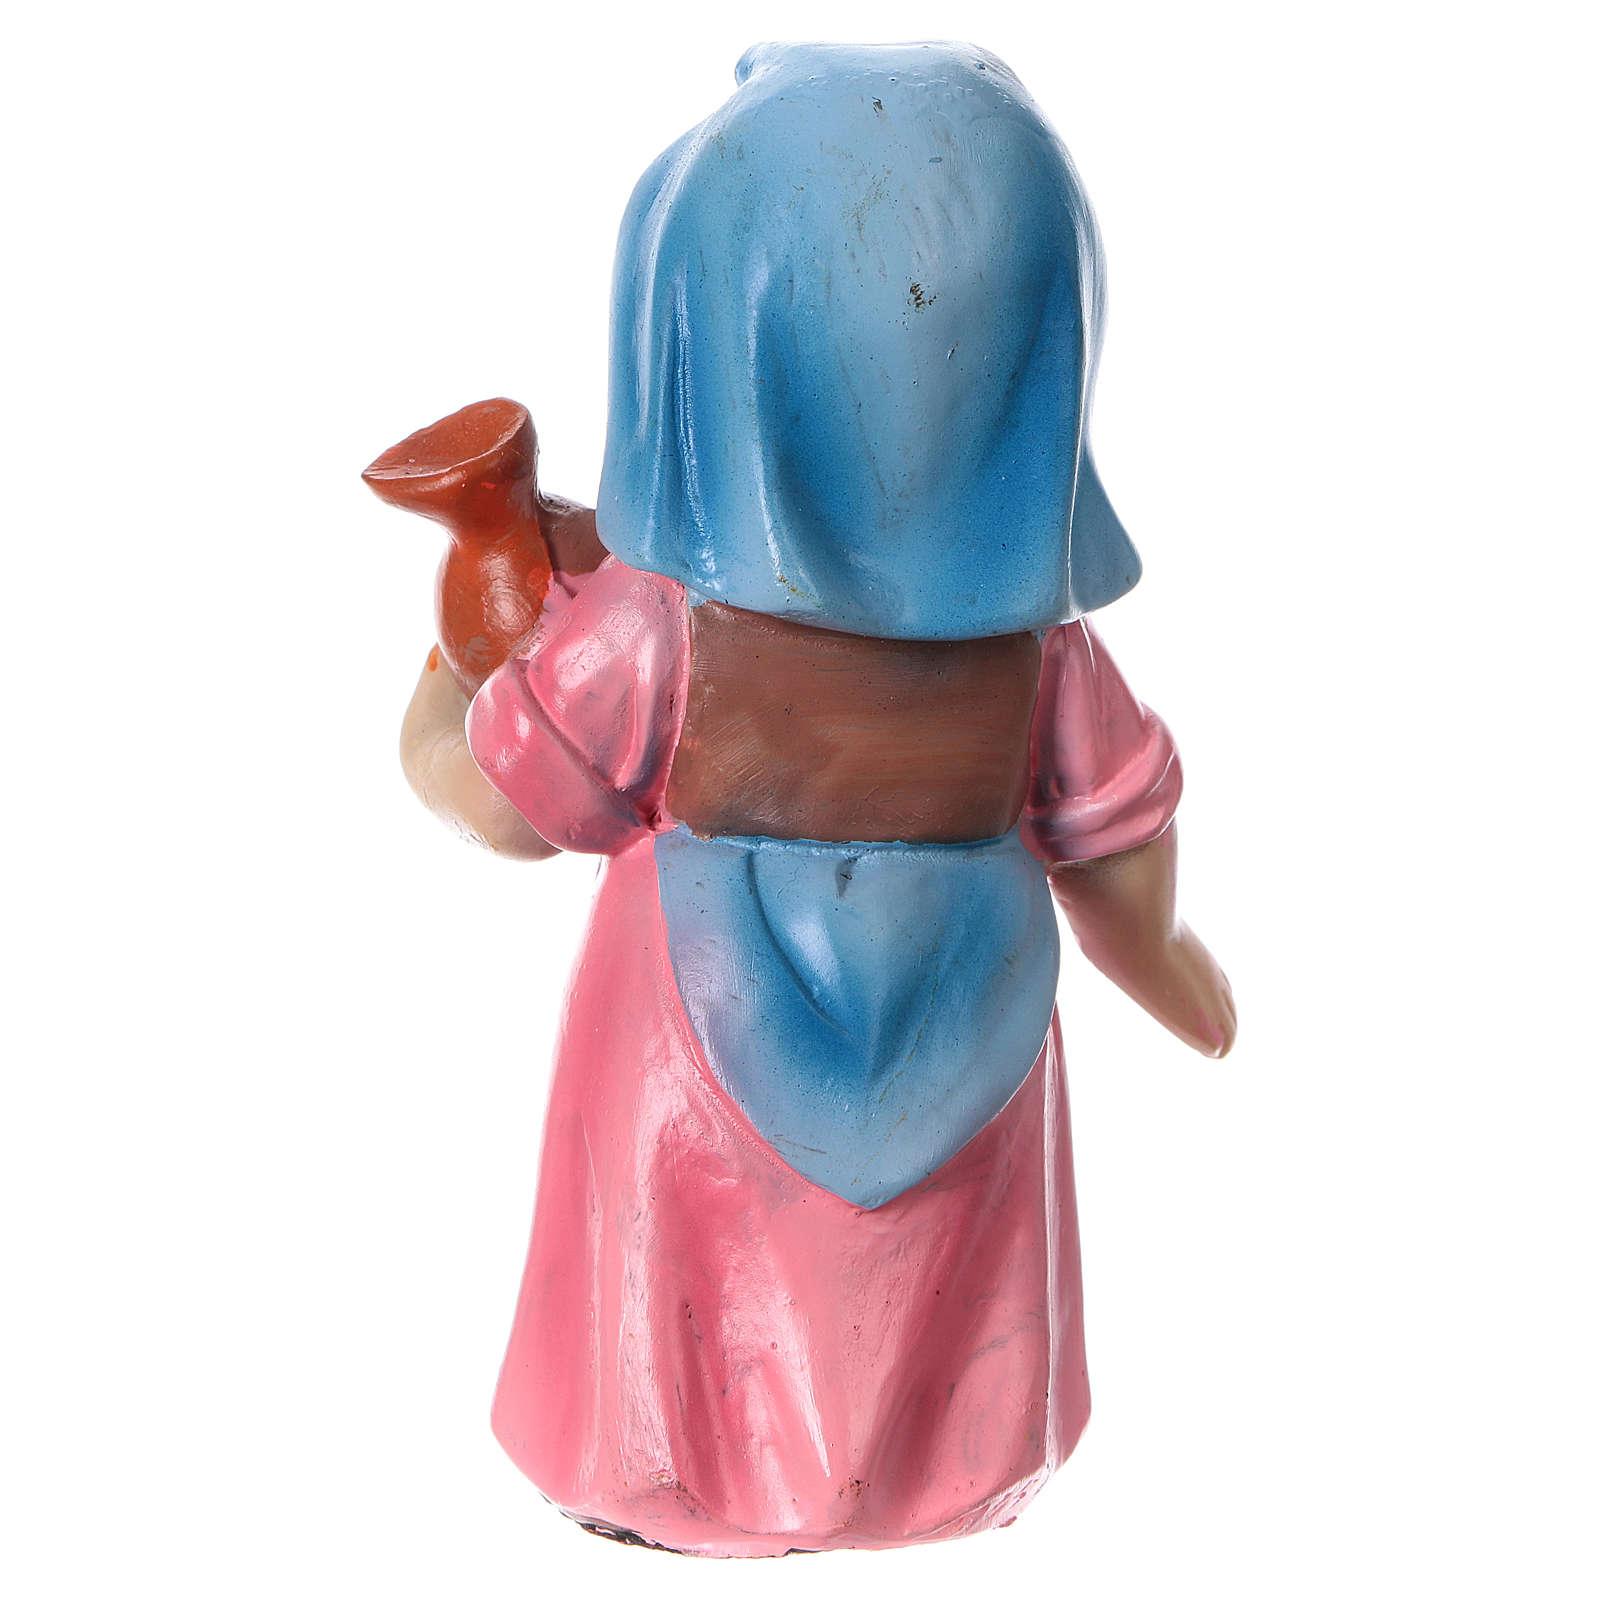 Estatua campesina con ánfora línea niño para belenes 9 cm 3